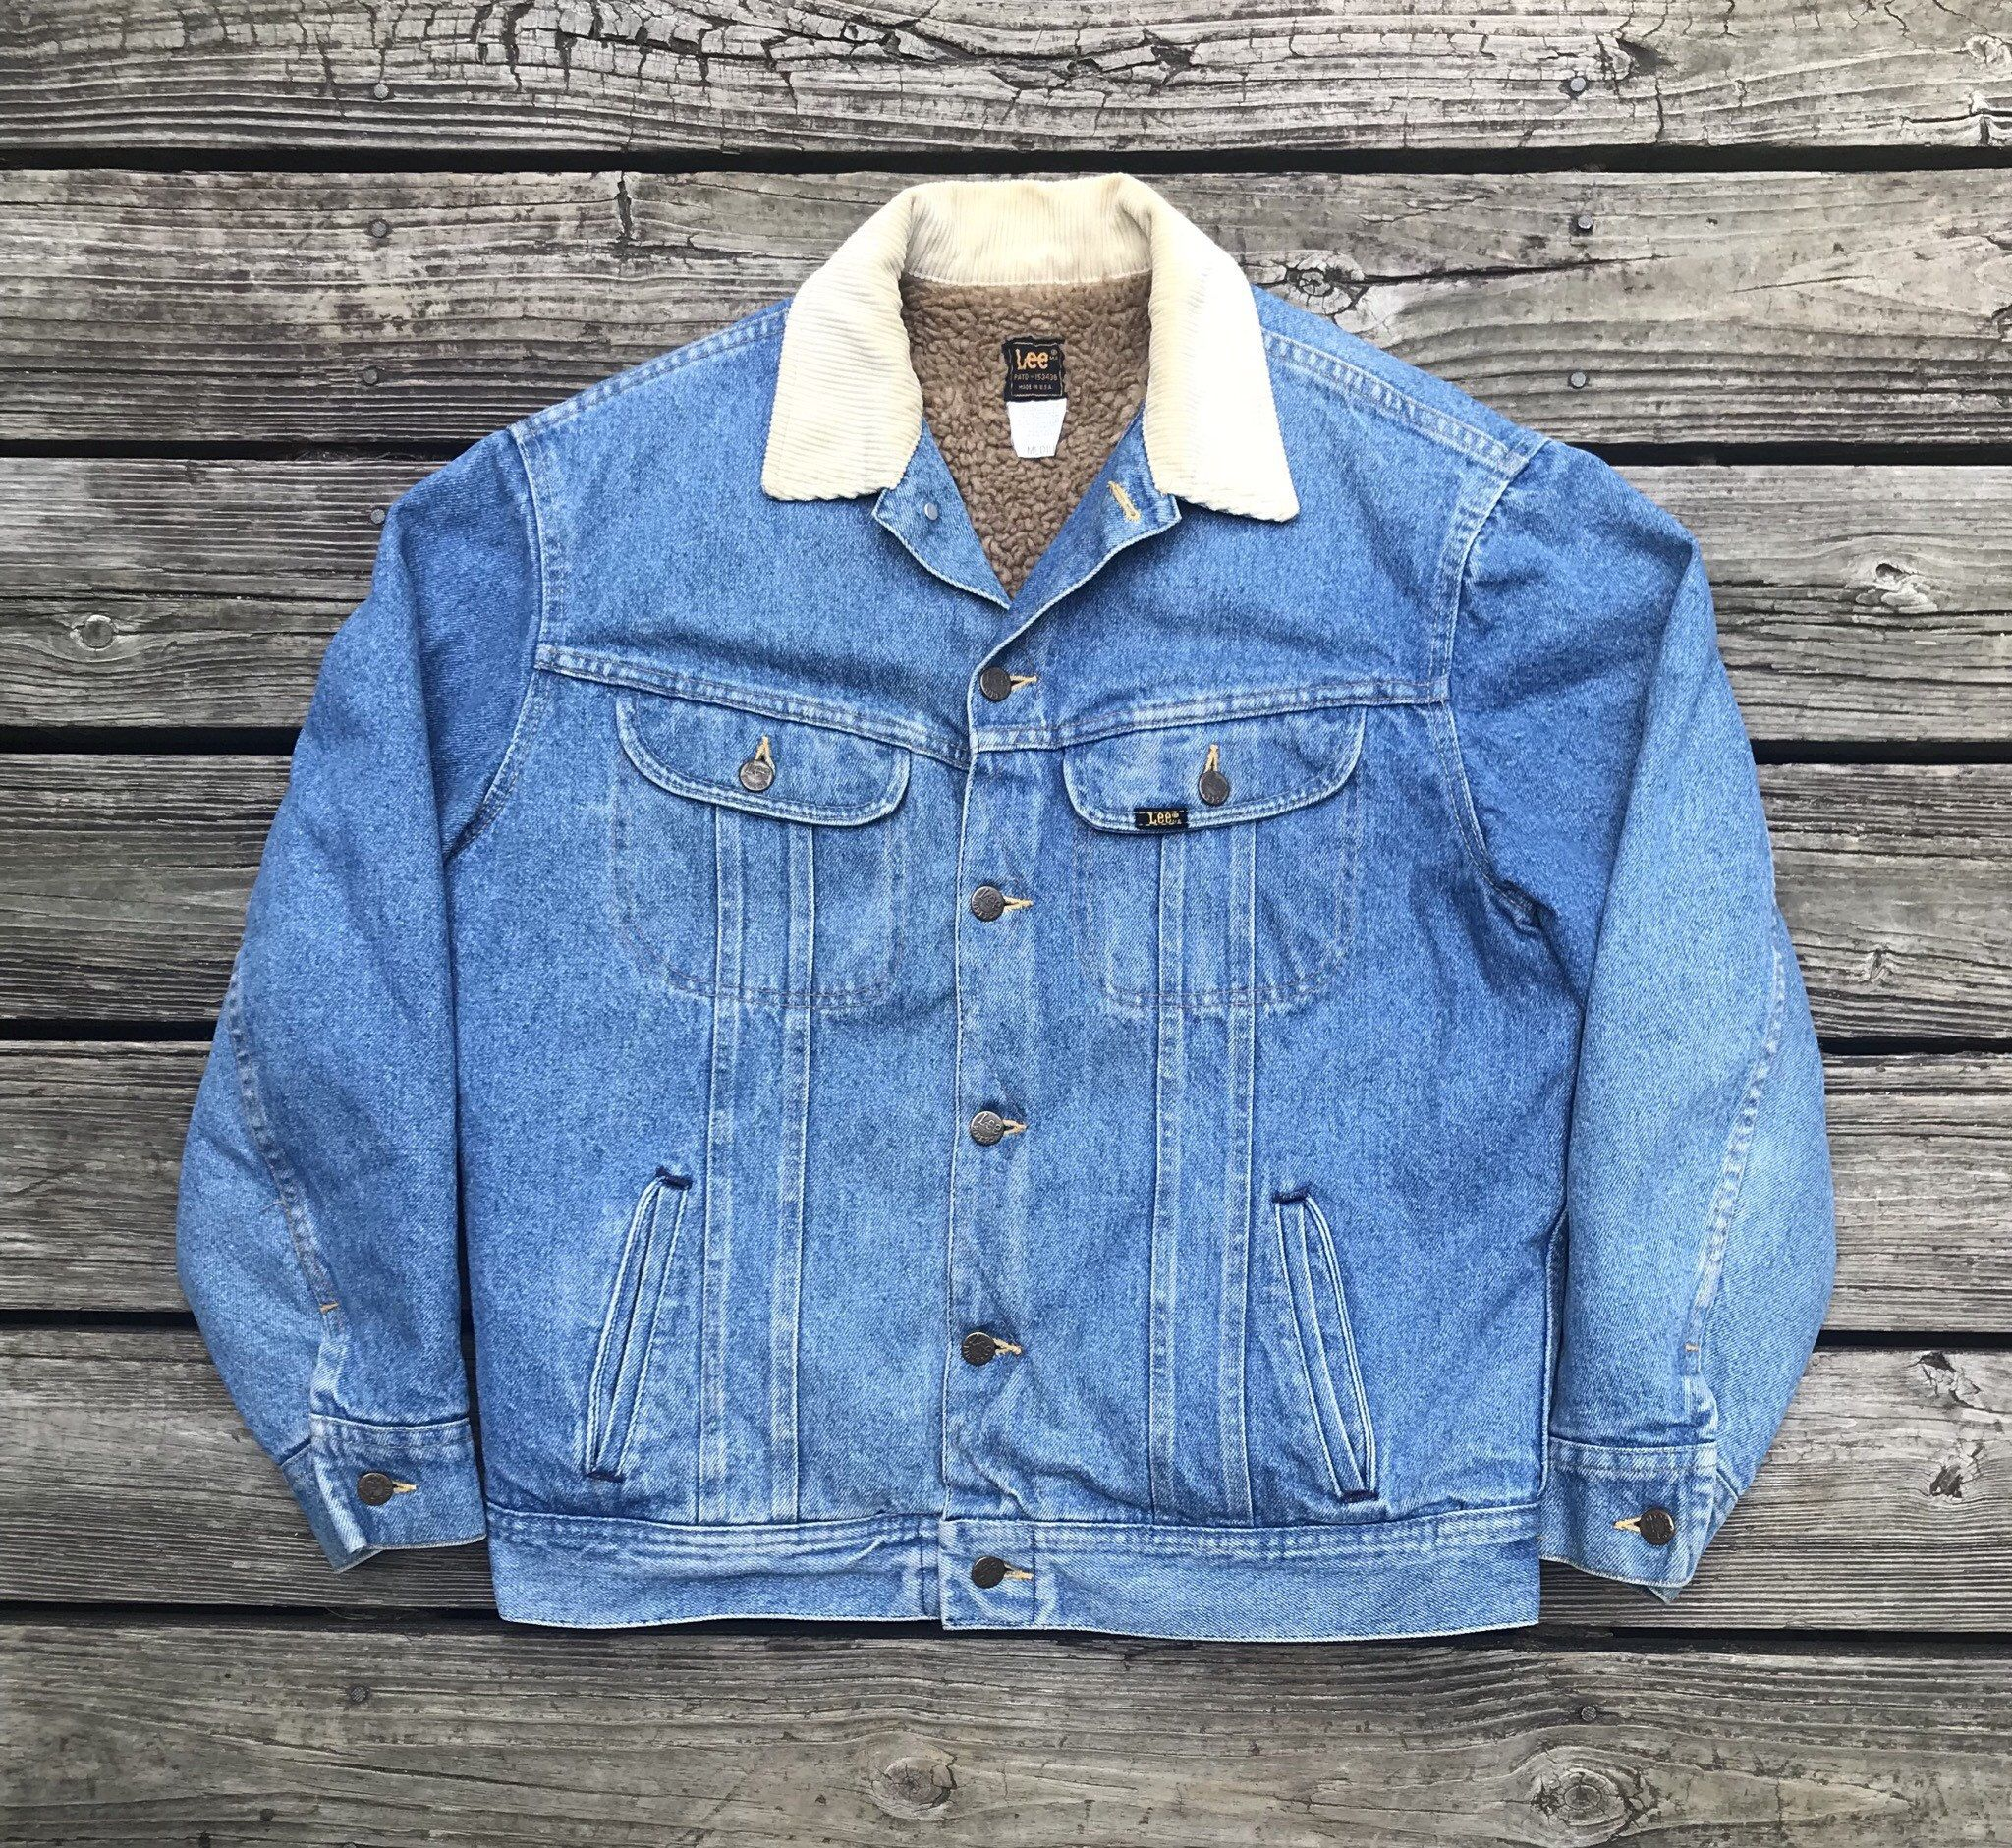 Shop Now Rebelfrayvintage On Etsy Lee Vintage 80s Trucker Cowboy Sherpa Lined Denim Jean Jacket Men S M Https Jean Jacket Men Denim Jean Jacket Denim Jacket [ 1881 x 2048 Pixel ]